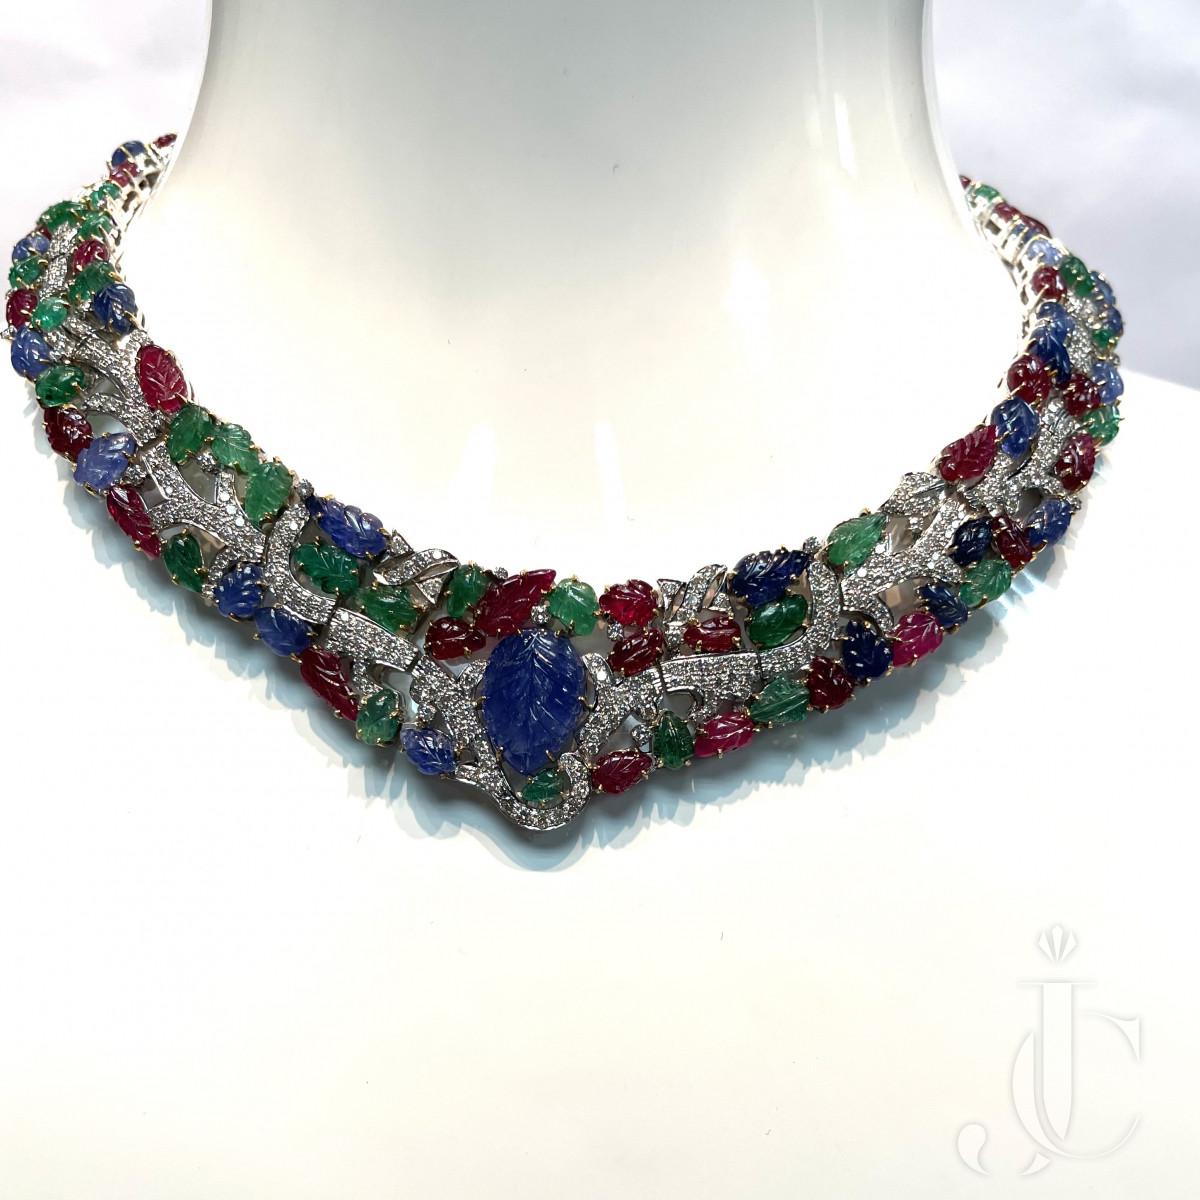 Stunning 18 KT WG Tutti Frutti Emerald Ruby Sapphire Necklace -597 carats